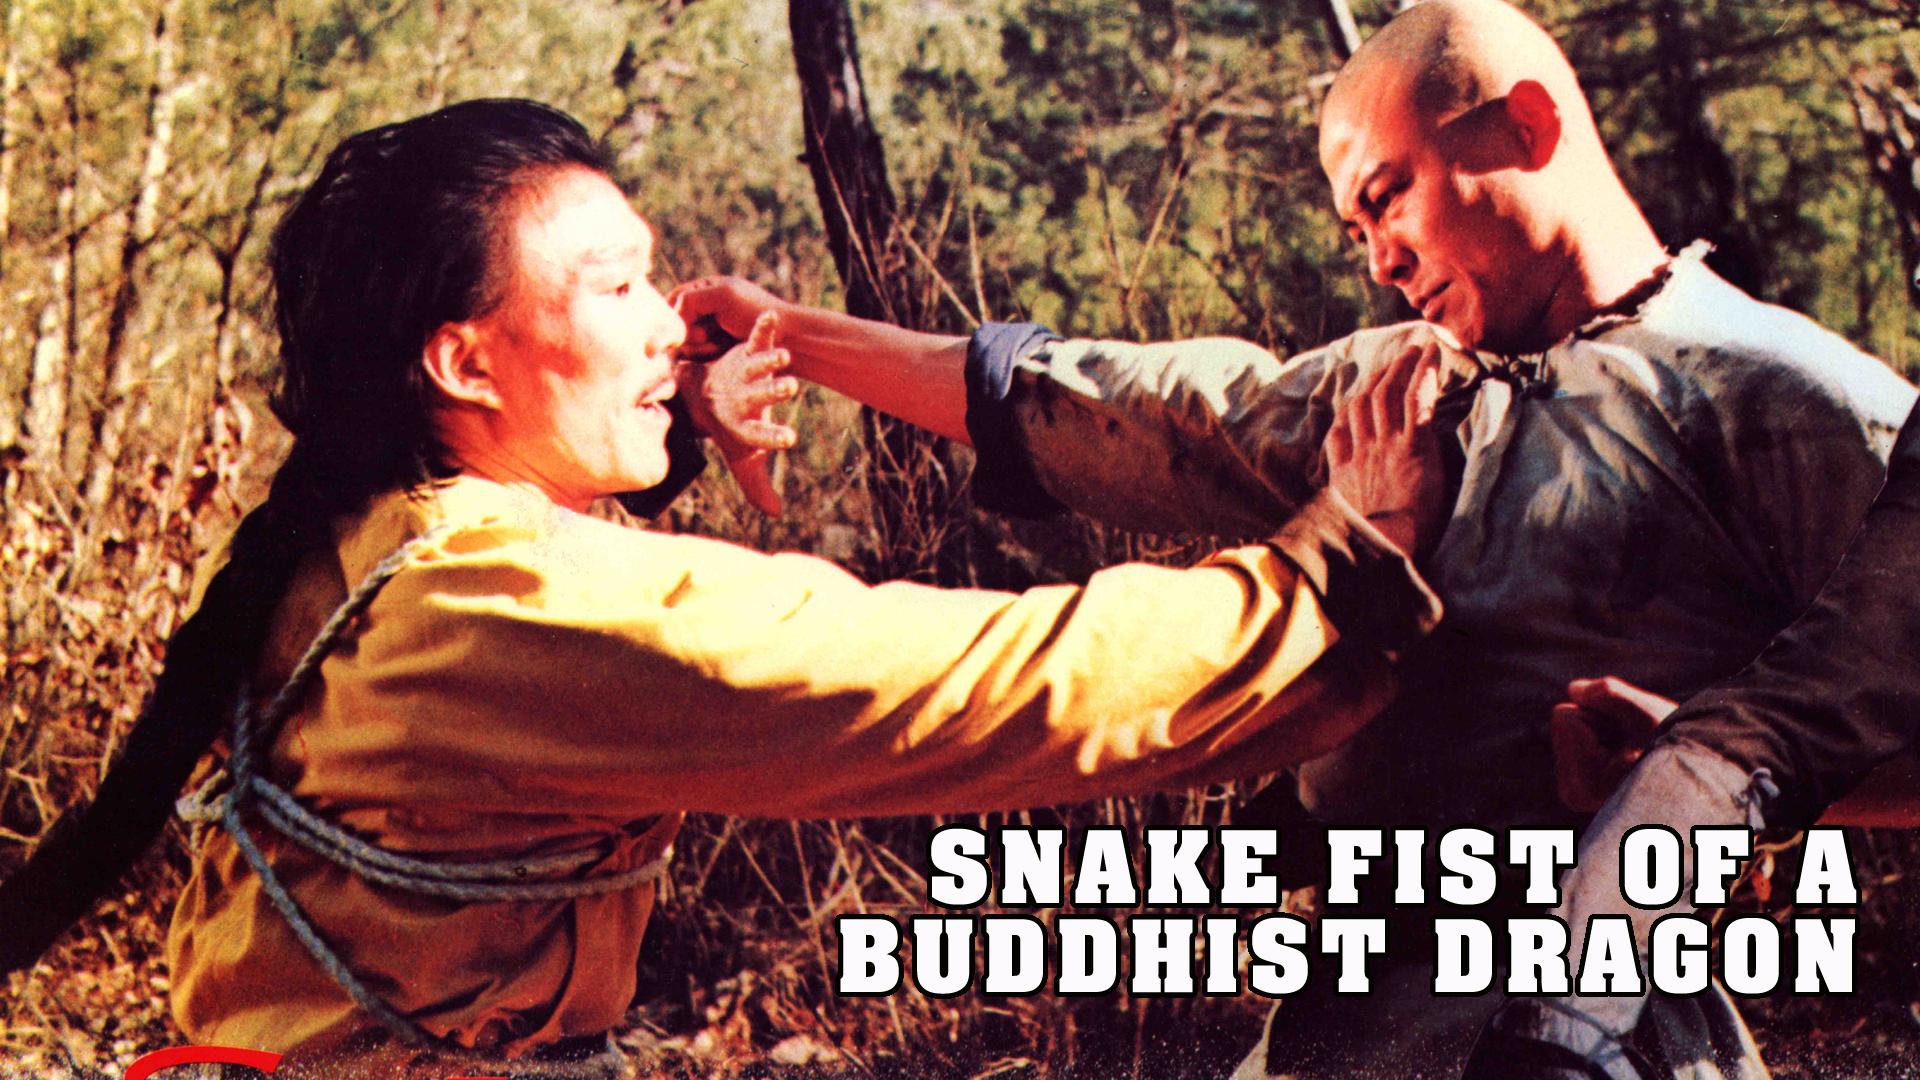 Snake Fist of a Buddhist Dragon